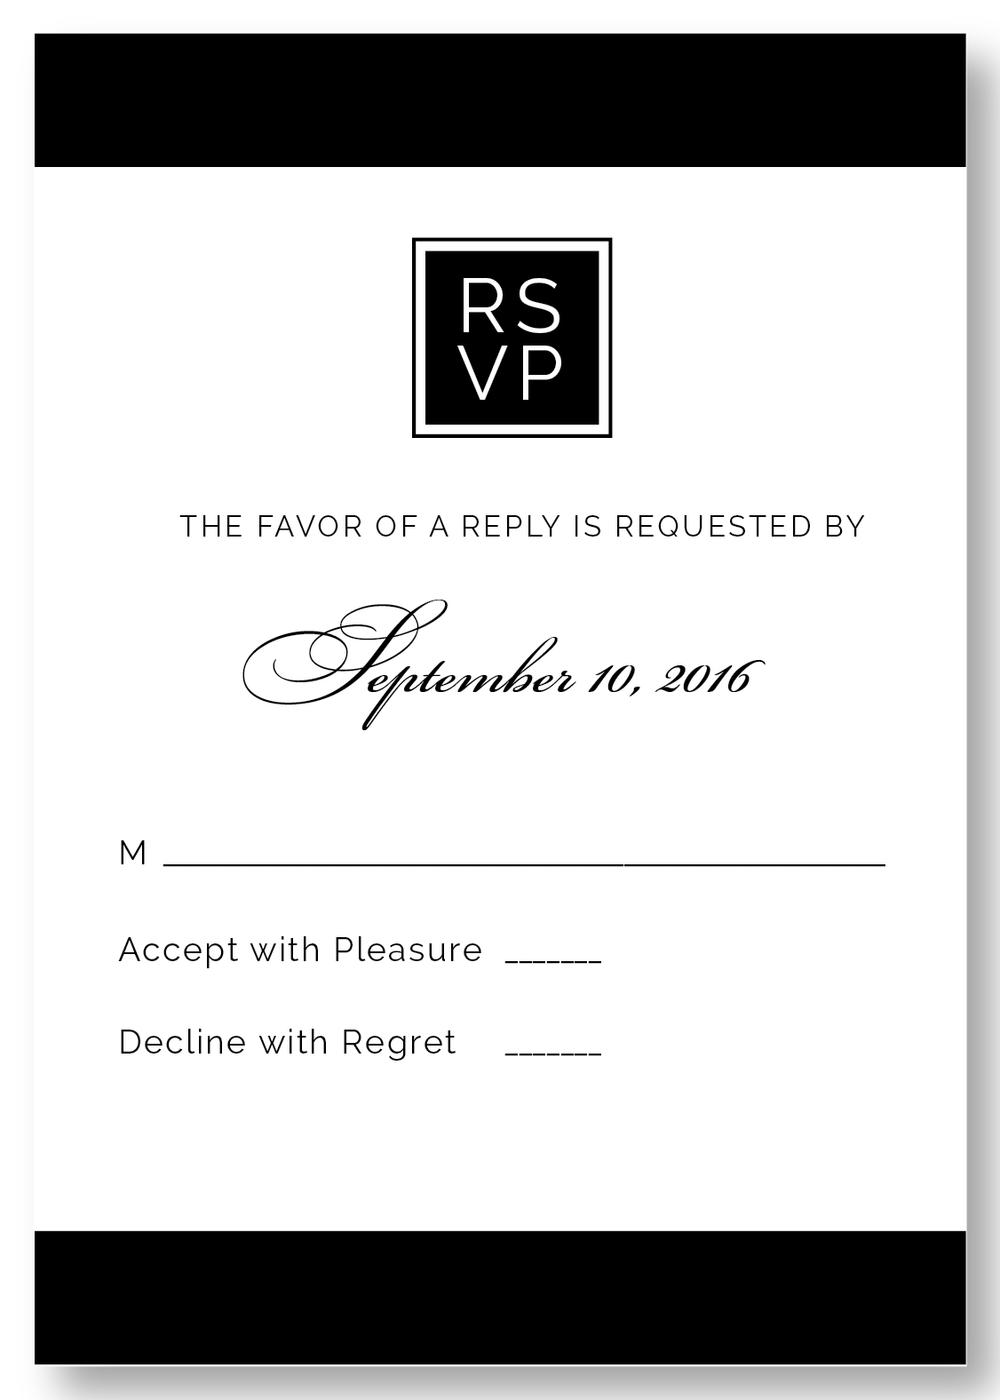 The Geneva - RSVP